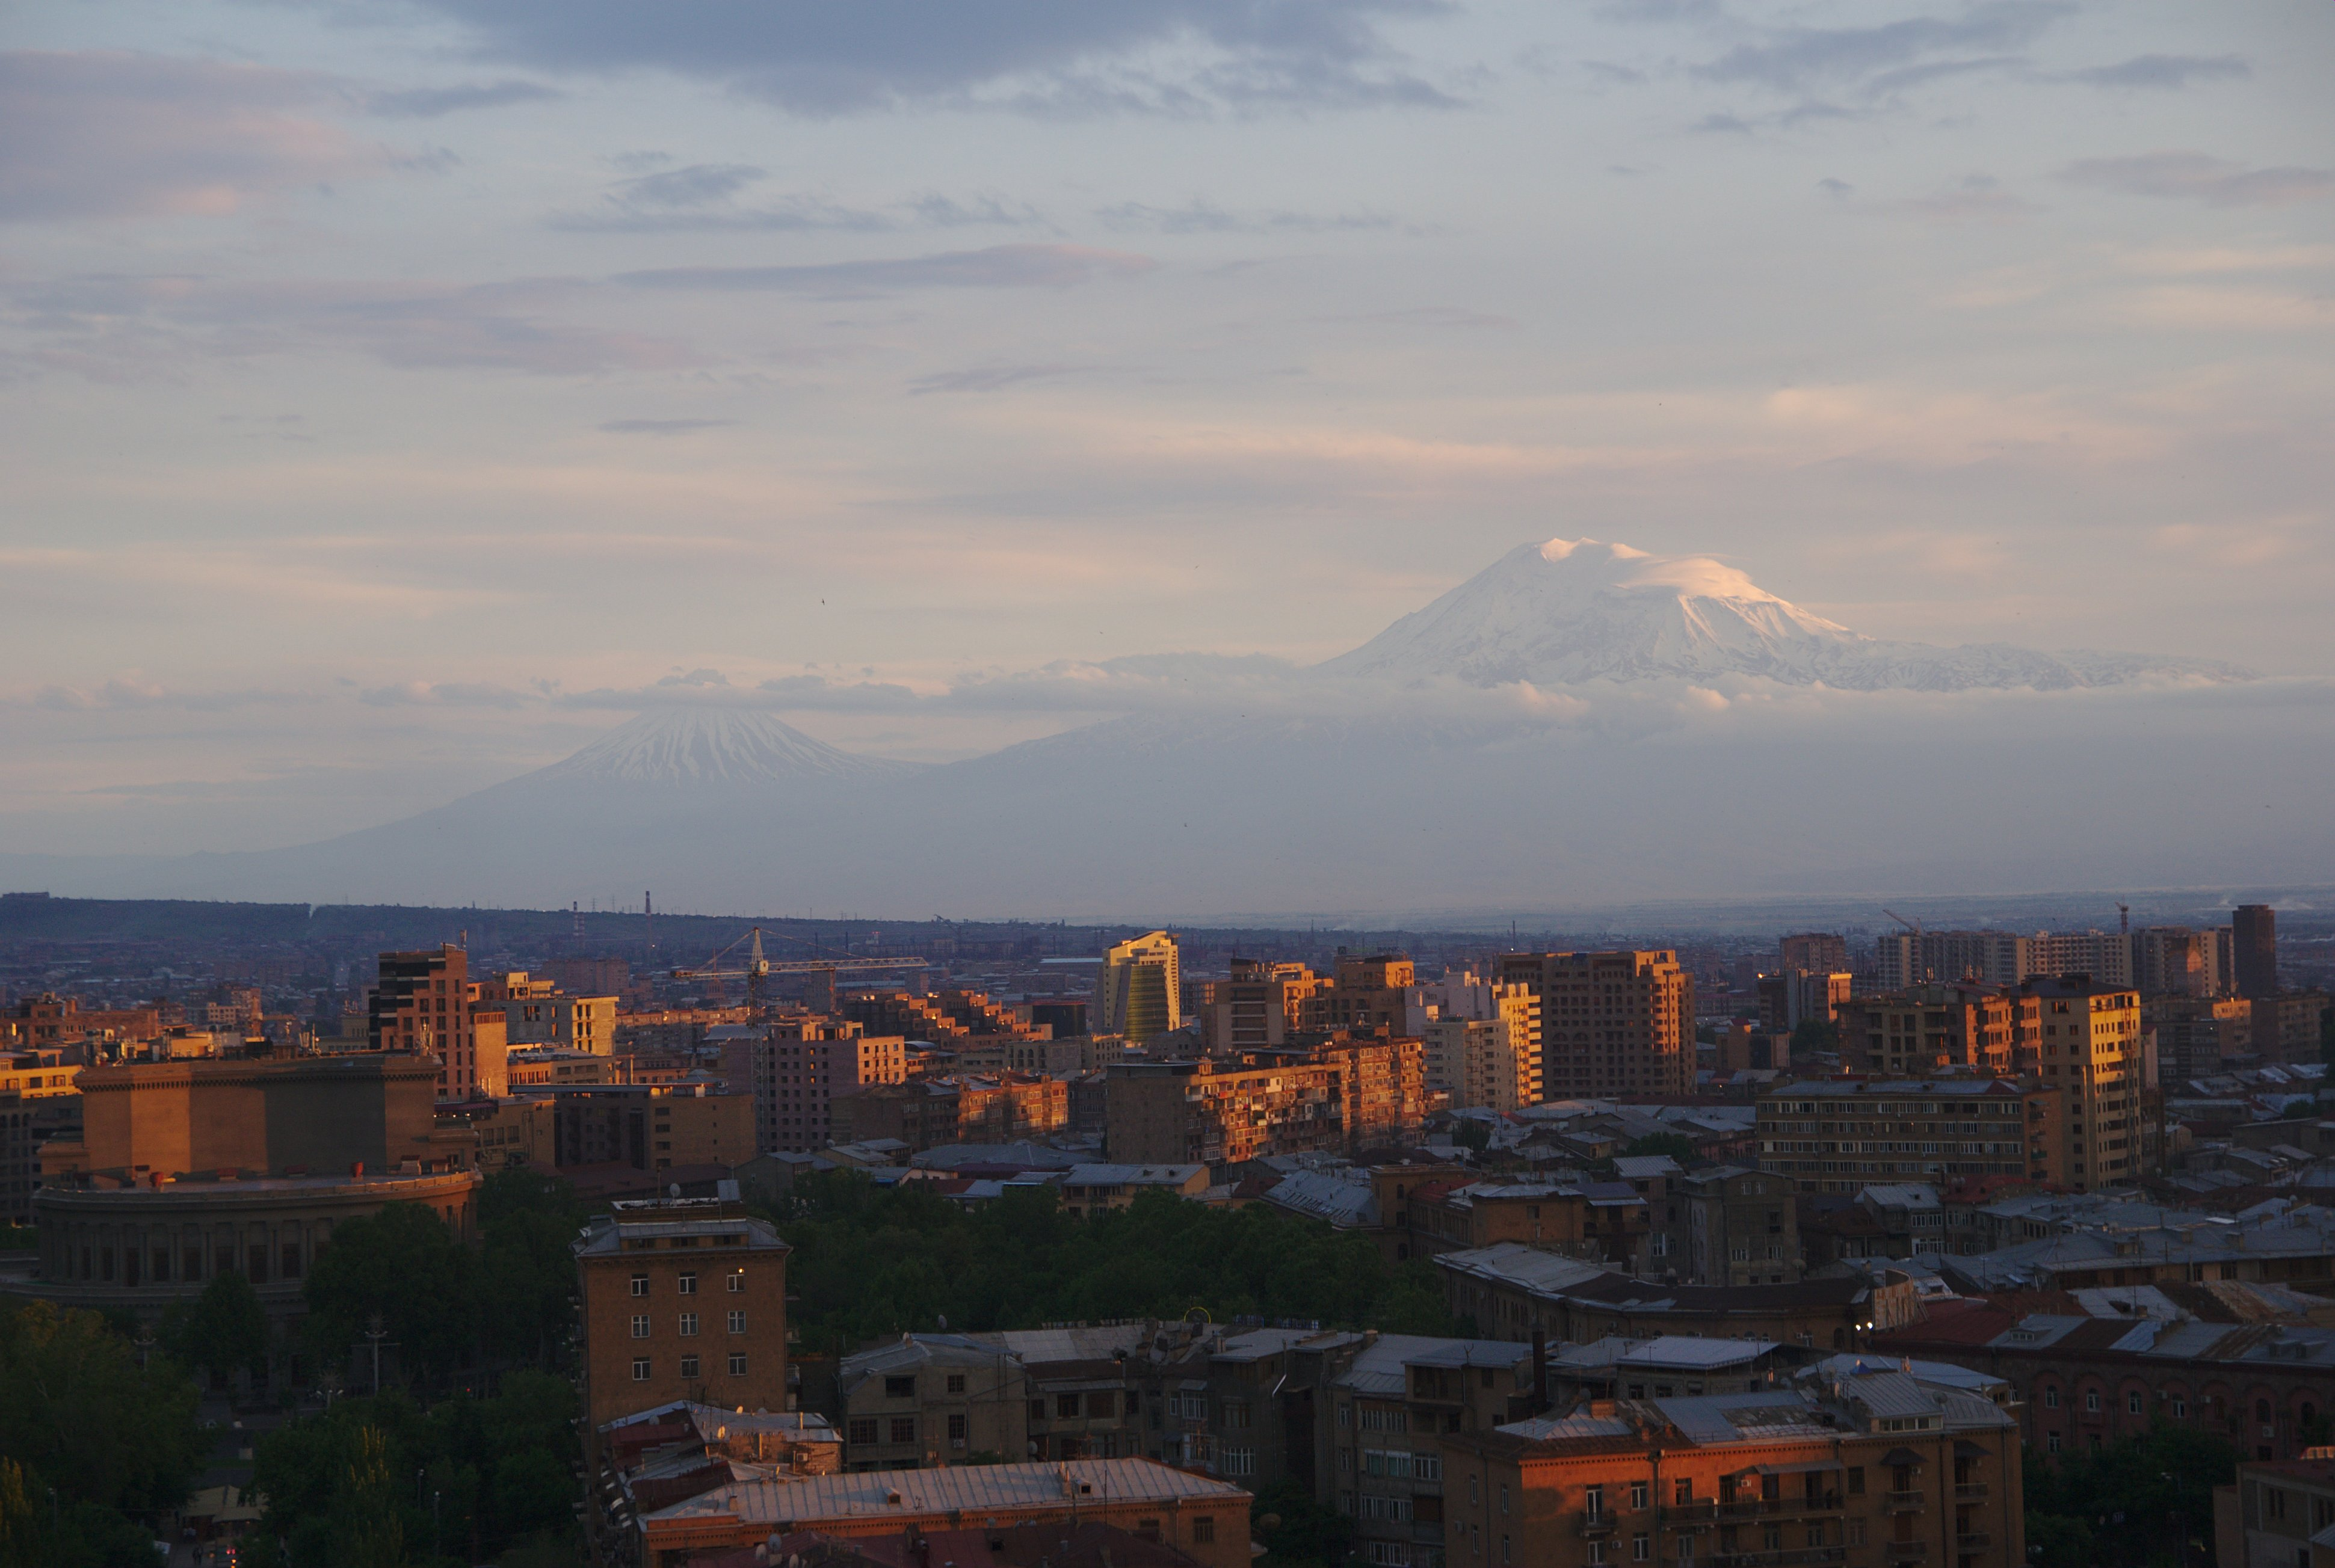 https://www.karpaten-offroad.de/wp-content/uploads/2021/07/Jerewan-mit-Blick-auf-den-Ararat.jpg